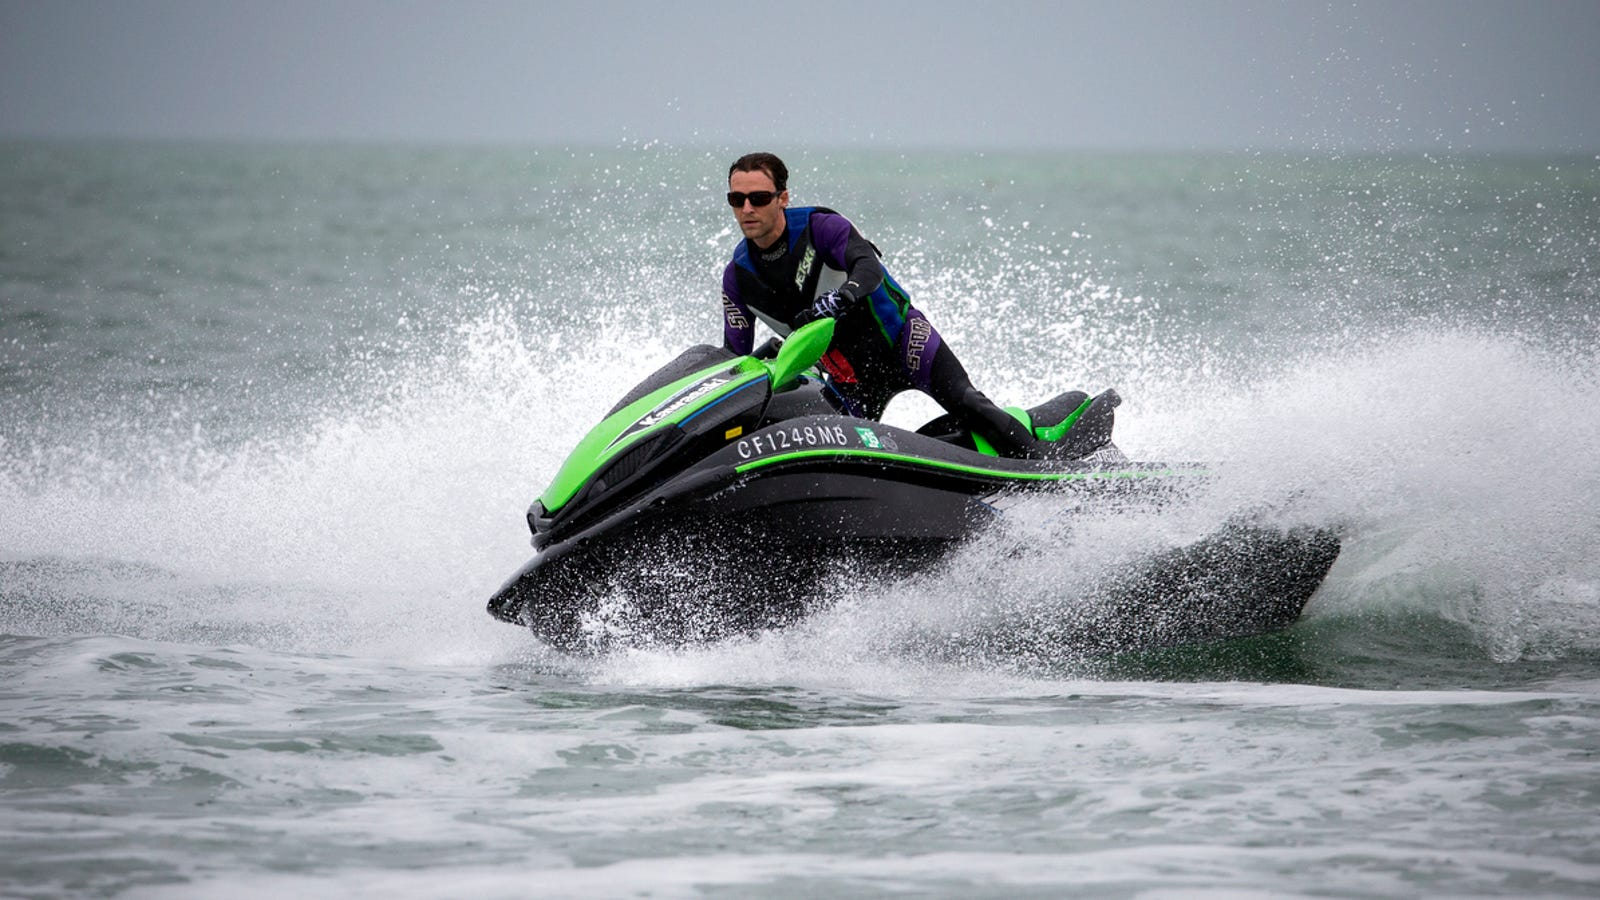 Kawasaki's 310-Horsepower Jet Ski Is Pure Madness